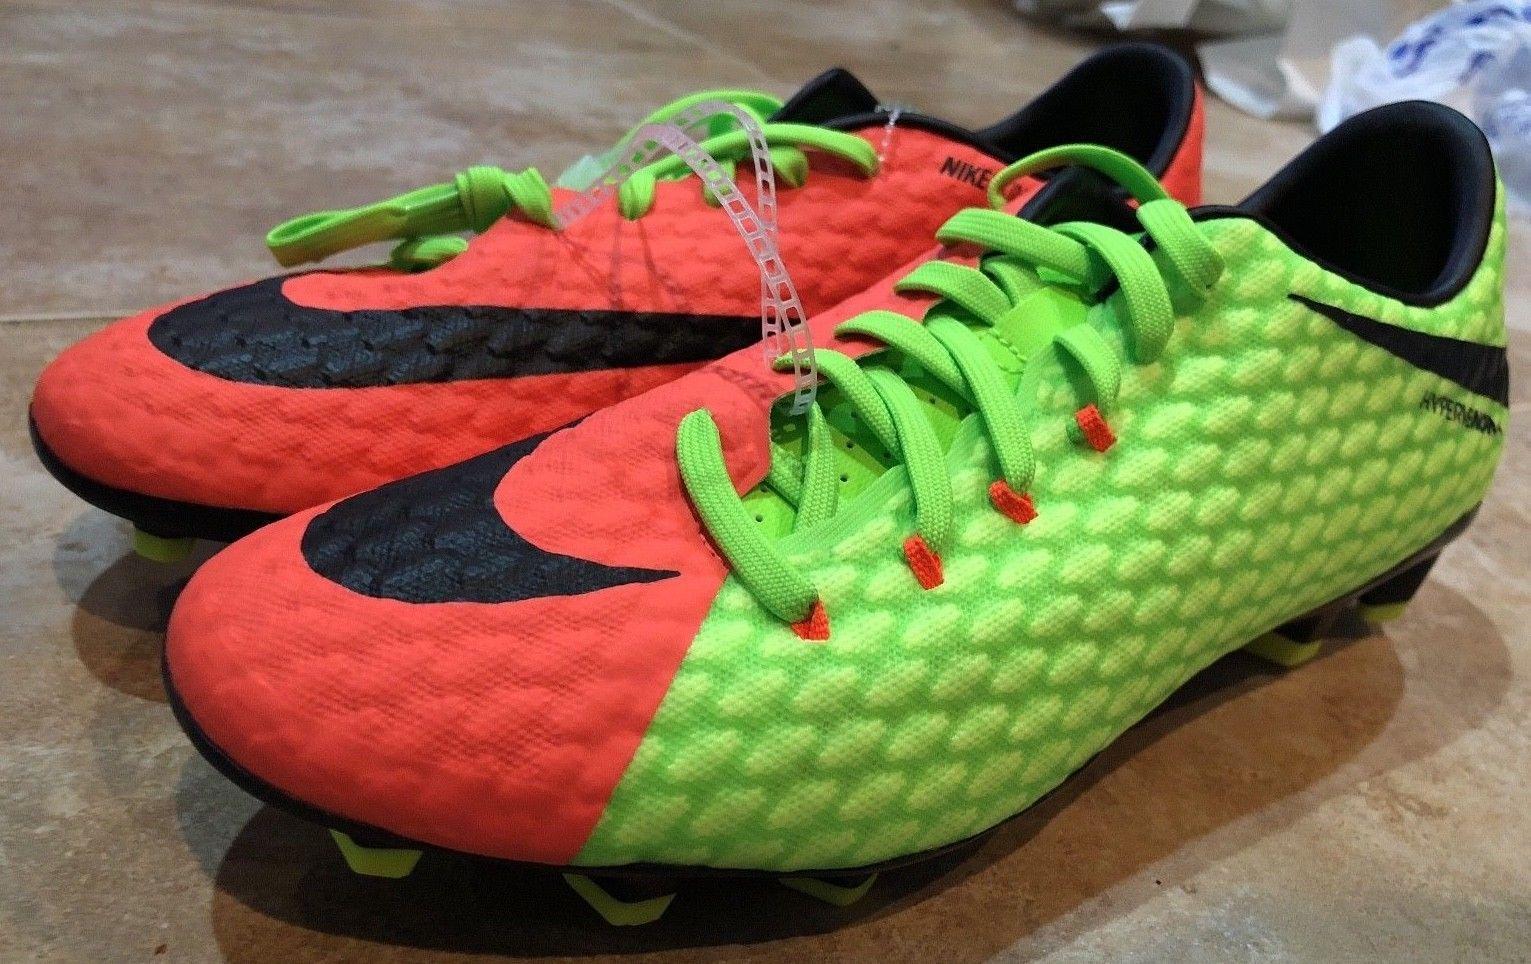 63ba78dae Nike Hypervenom Phelon III FG Green Orange 852556-308 Men s Sz 8 Soccer  Cleats